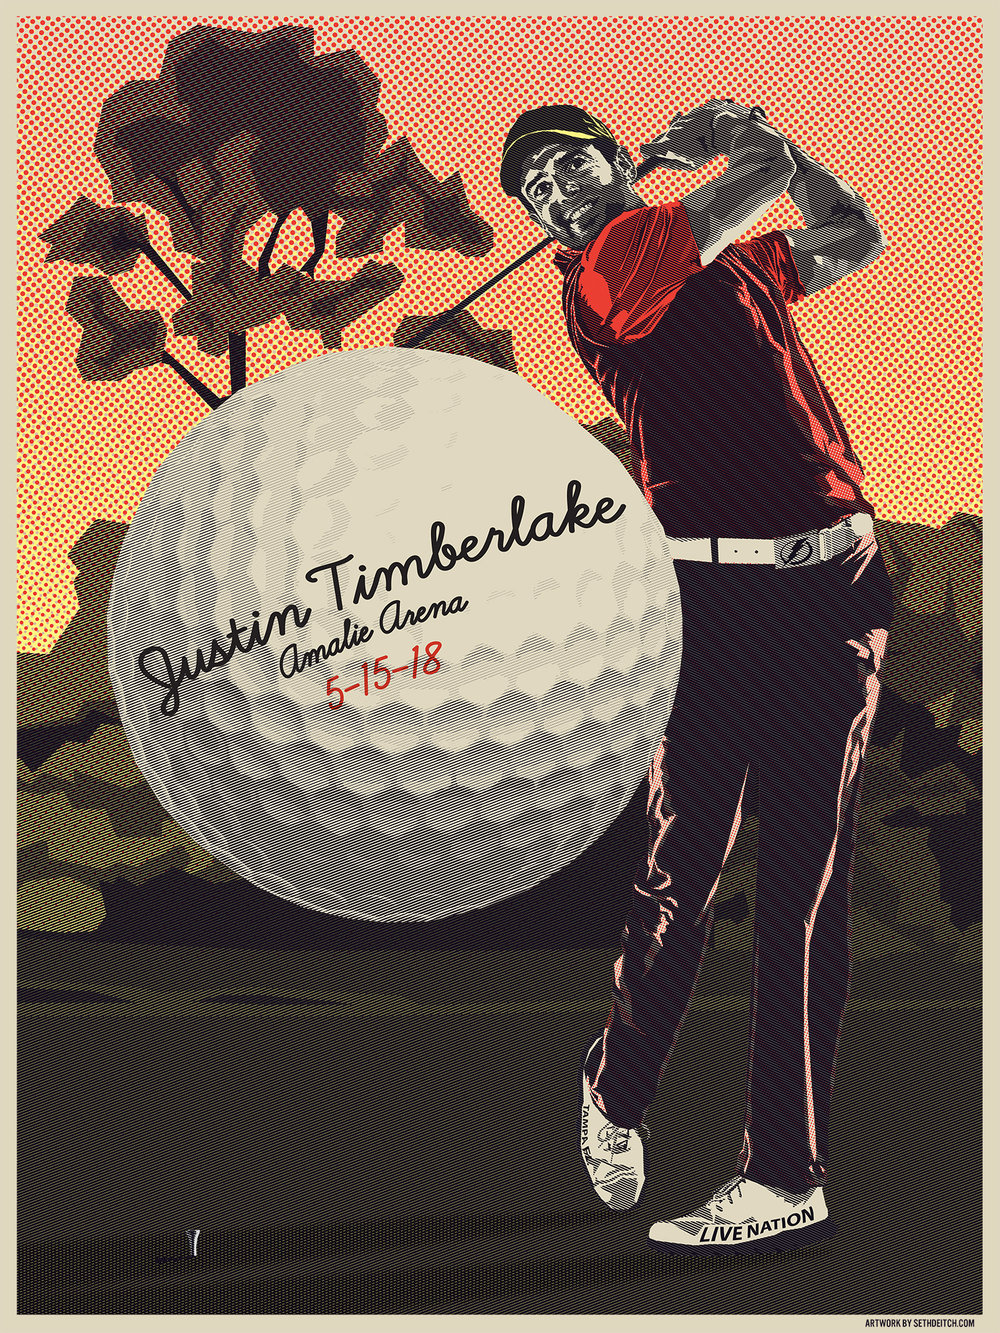 Justin Timberlake - 3 Color Screen Print - Edition of 40